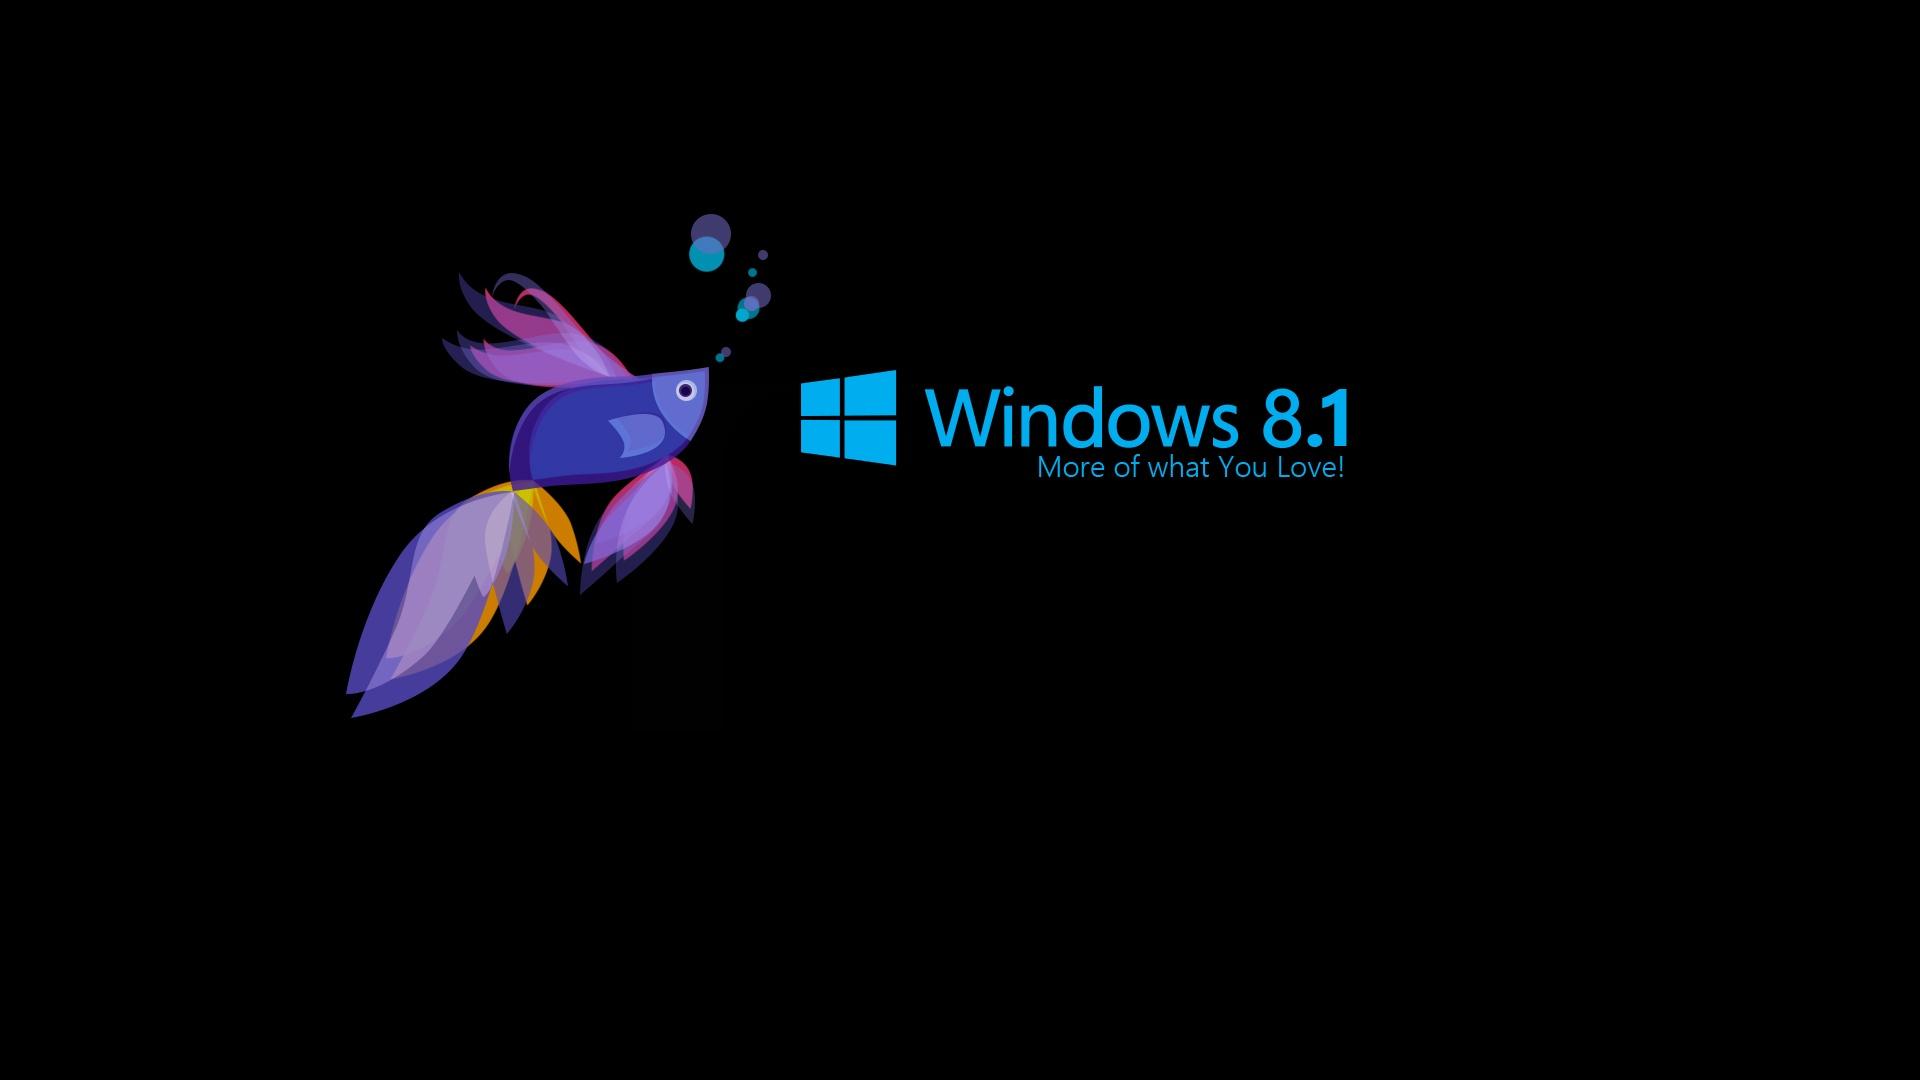 Good Wallpaper High Quality Windows 8 - mvVMEe  HD_32121.jpg